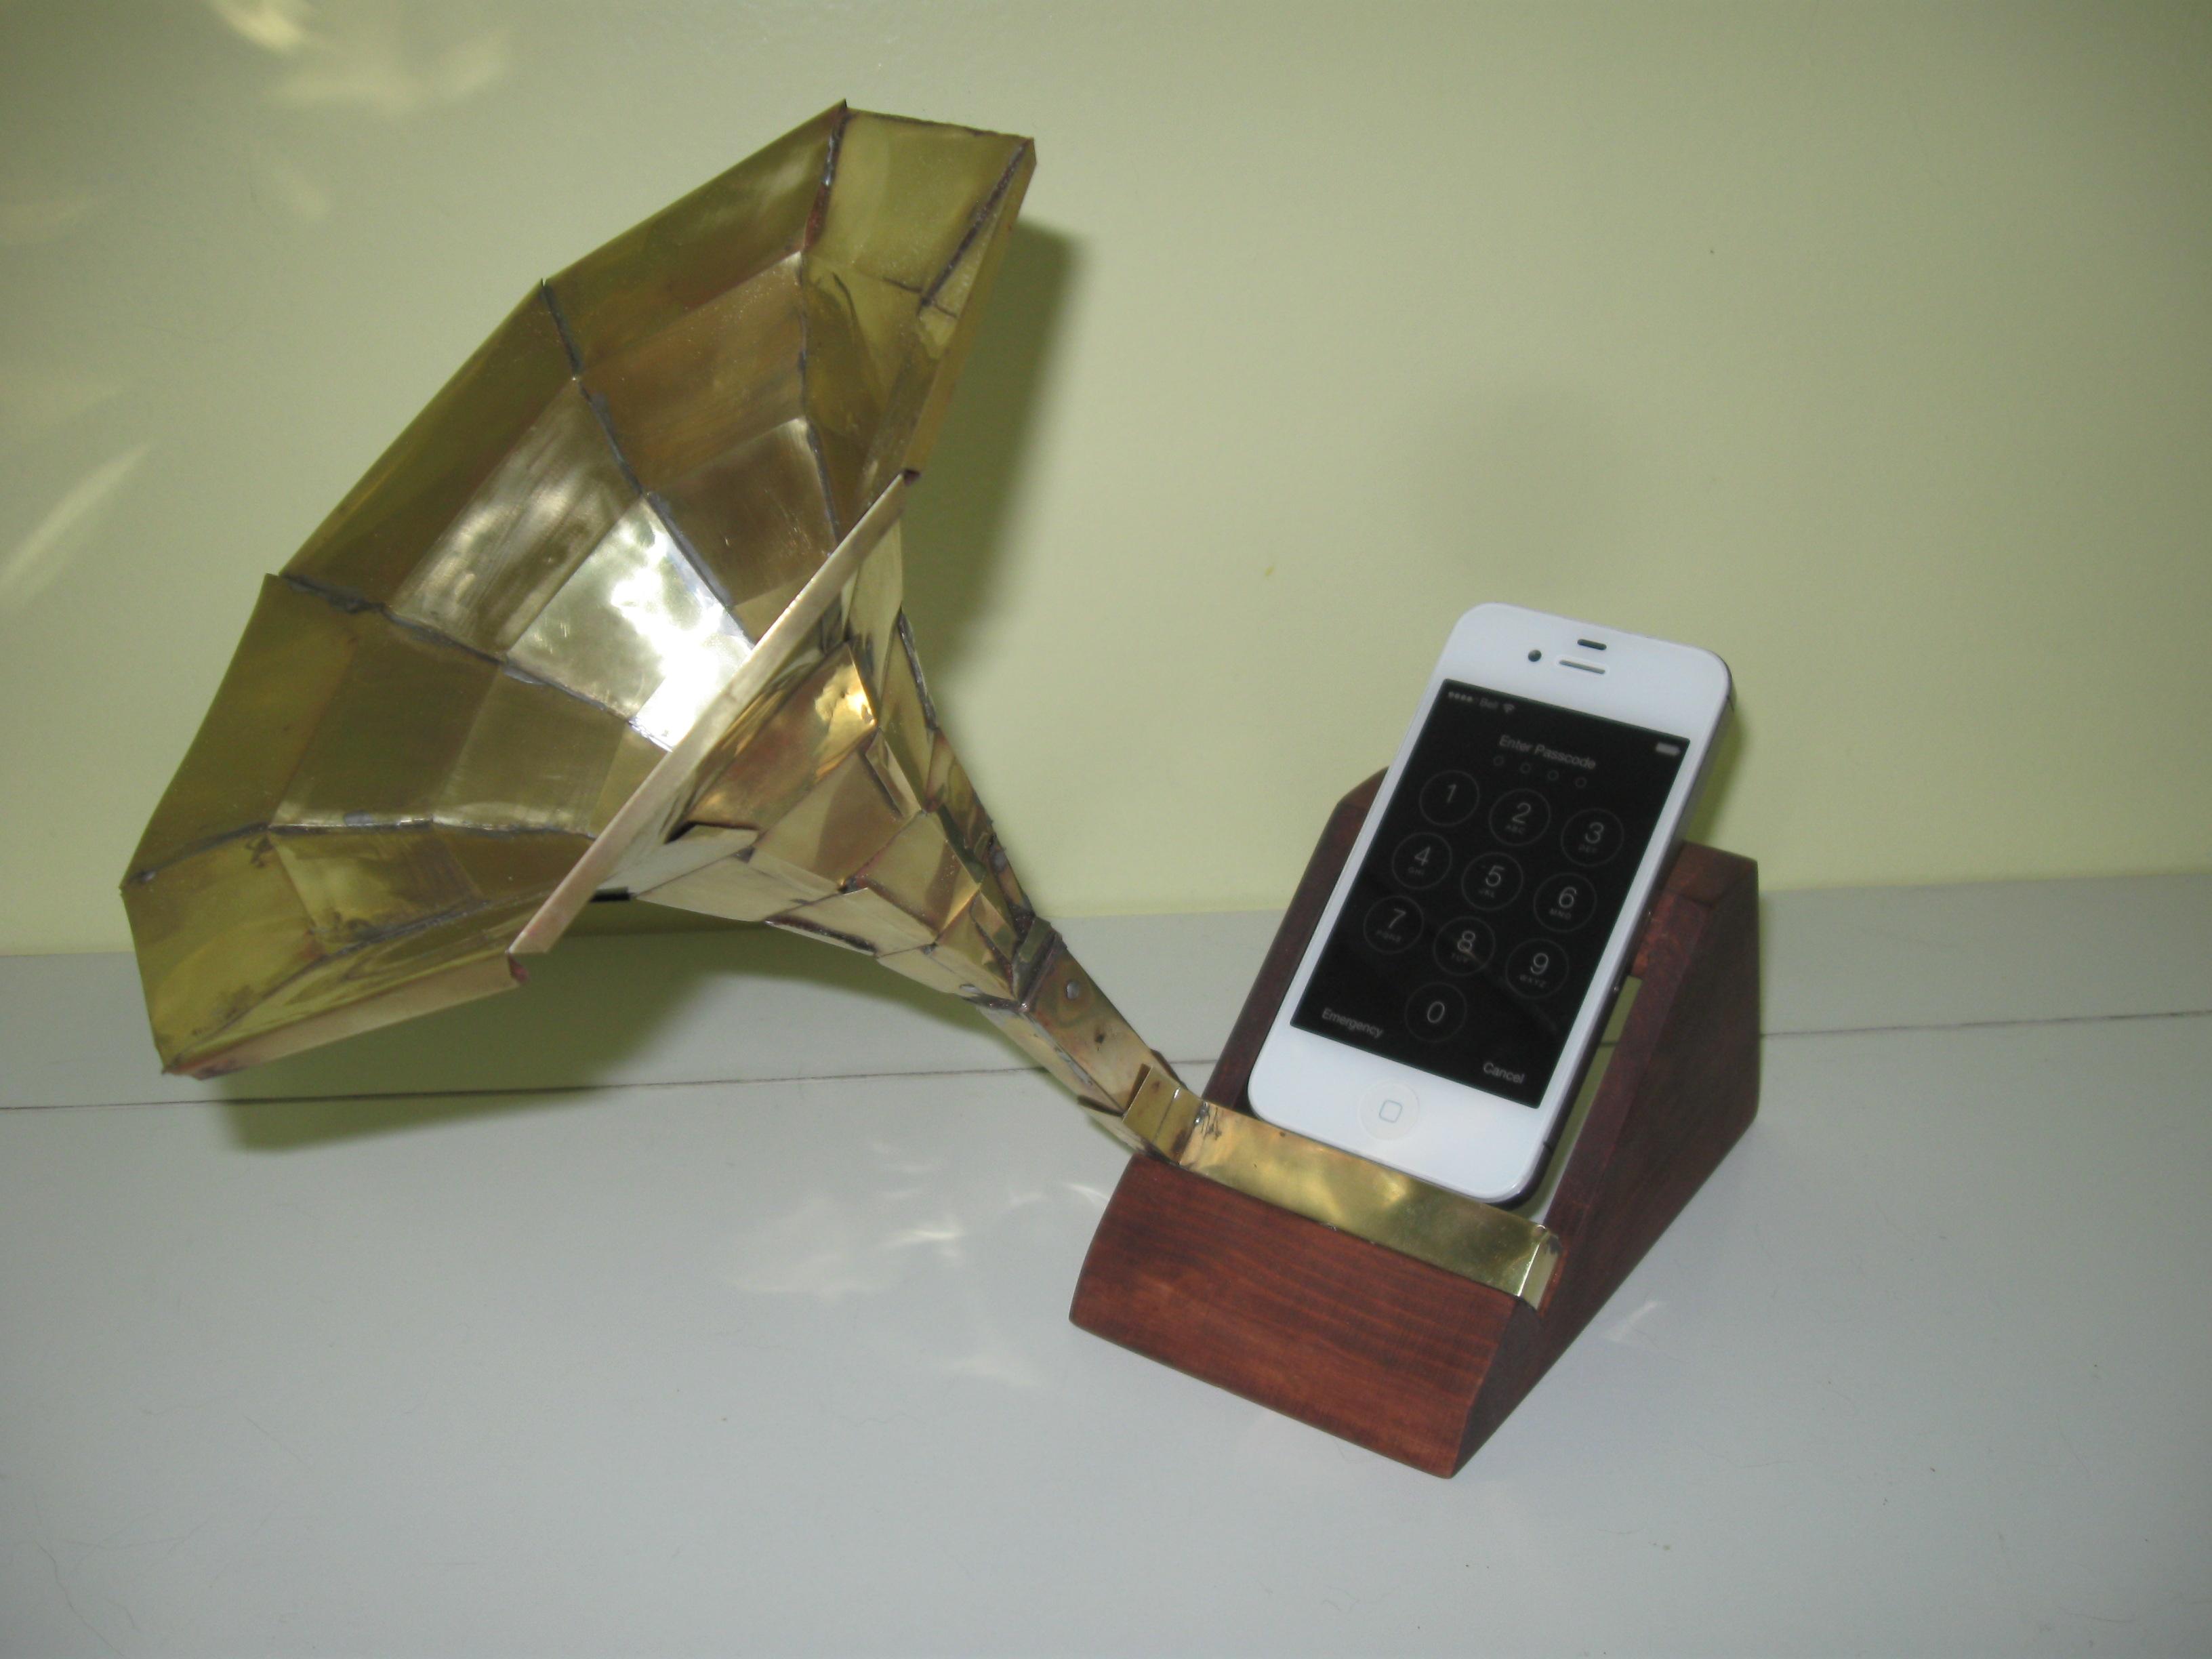 Gramophone dock AKA Shiny Metal Papercraft